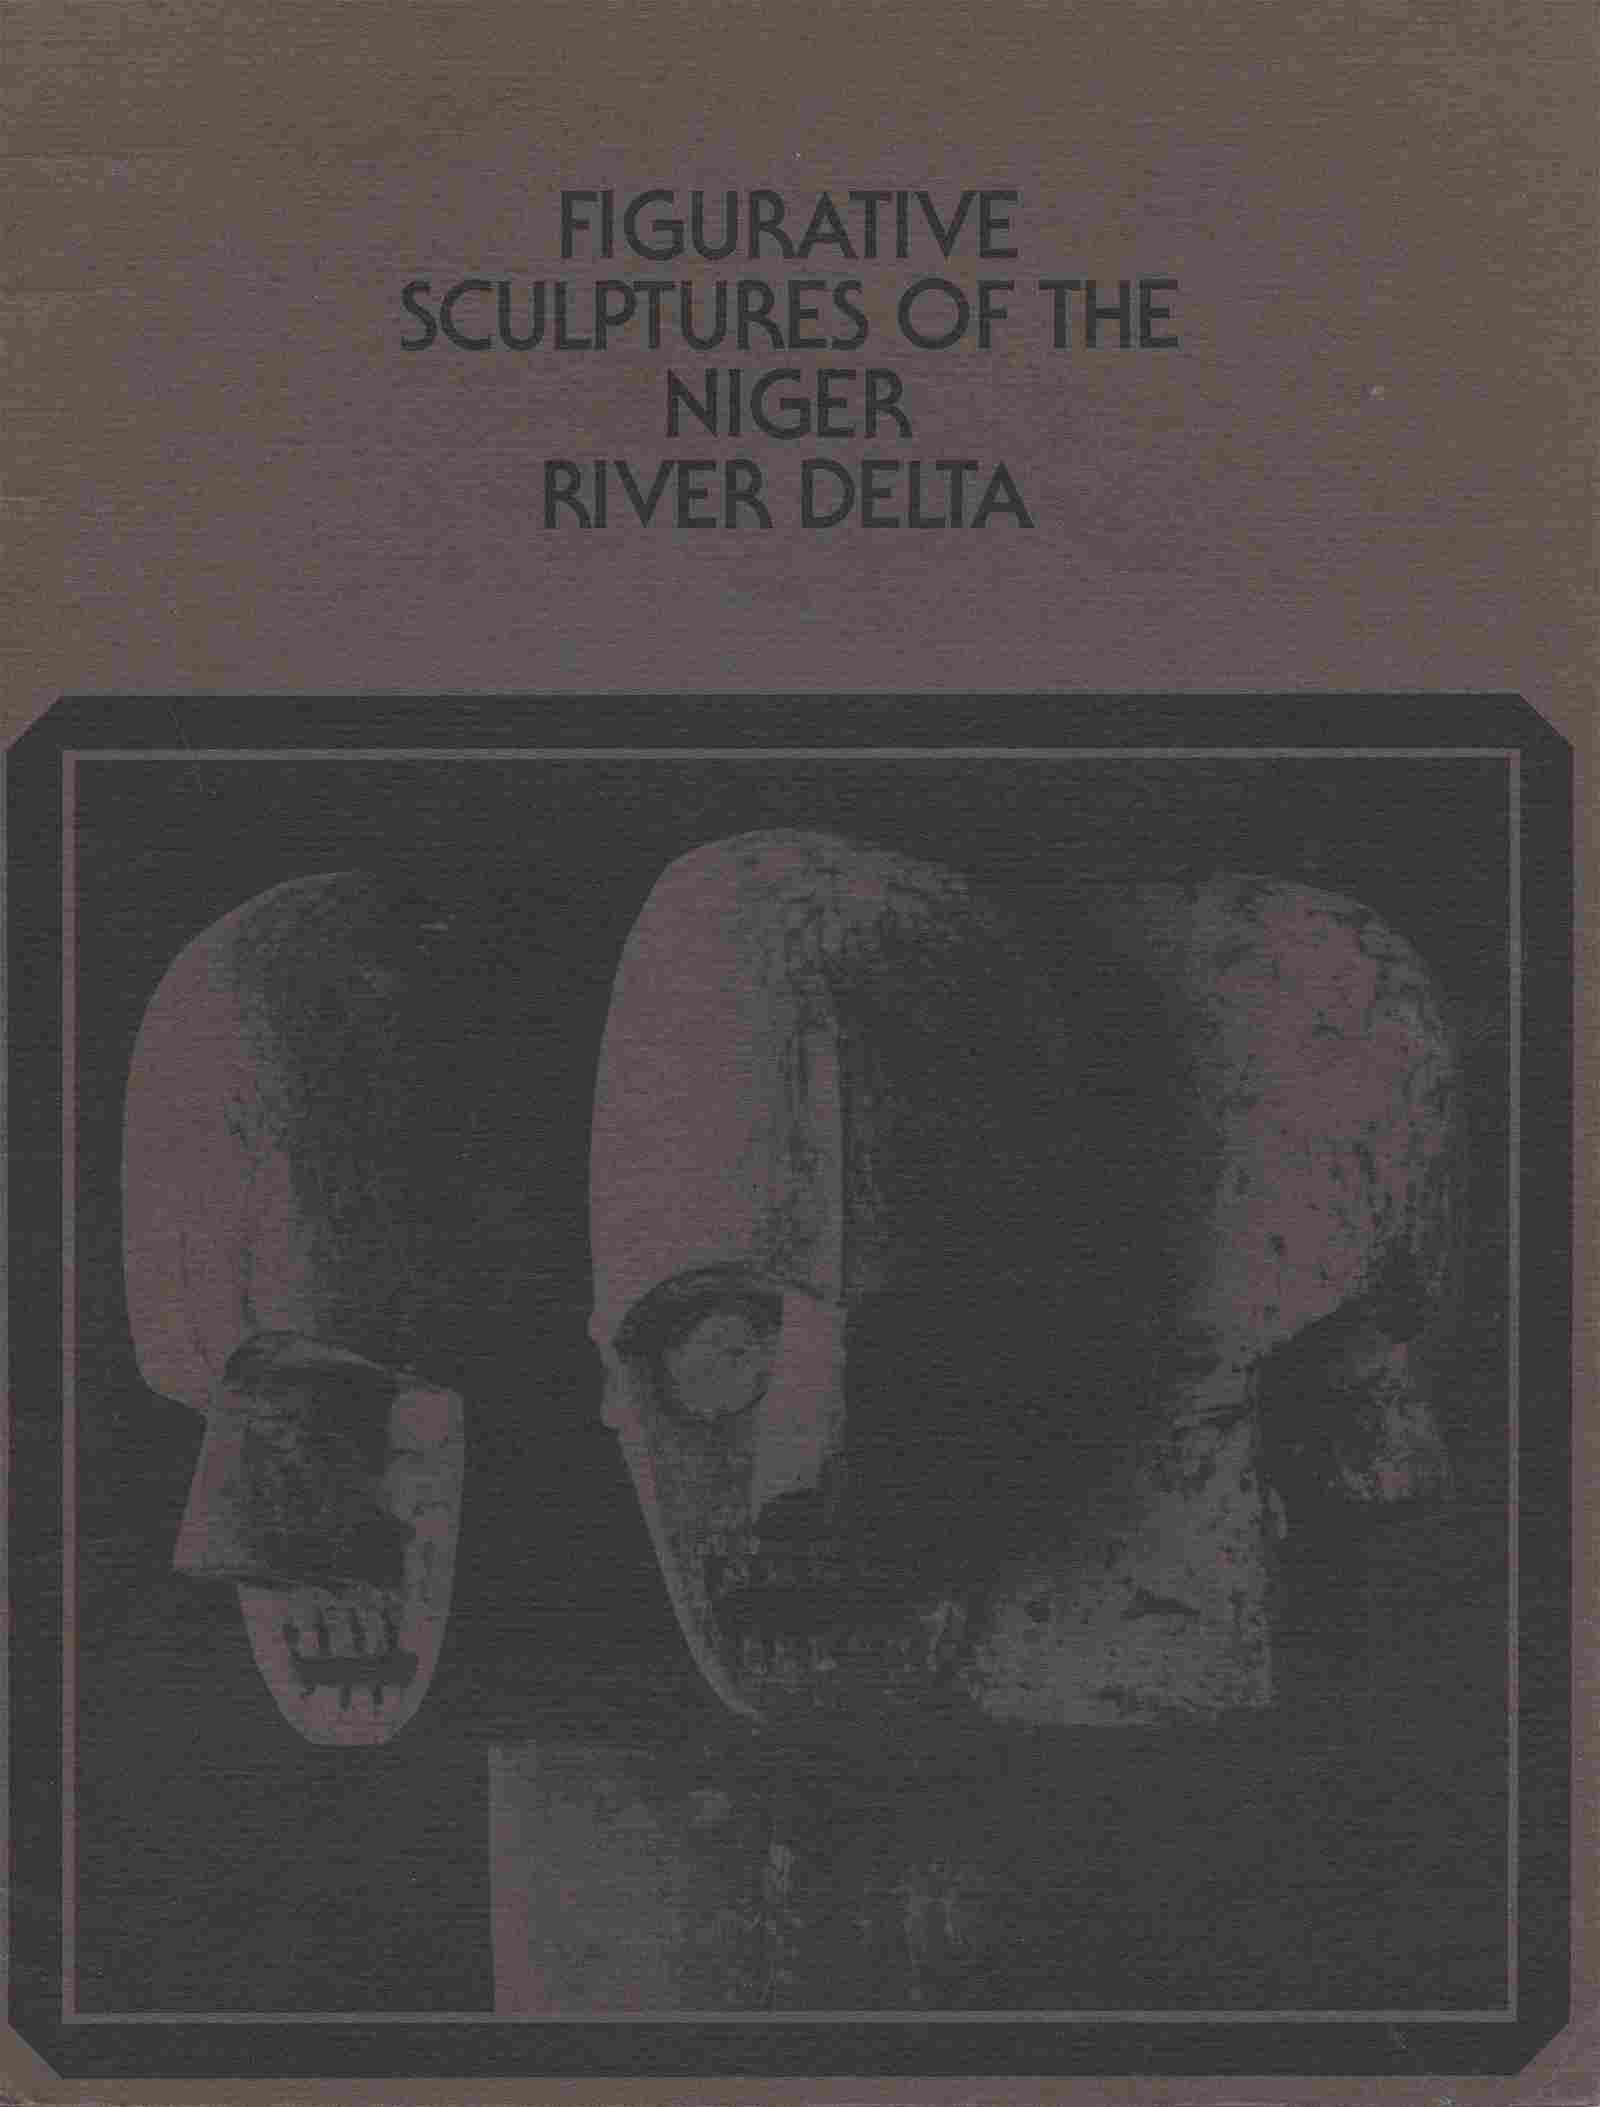 Figurative Sculptures of the Niger River Delta